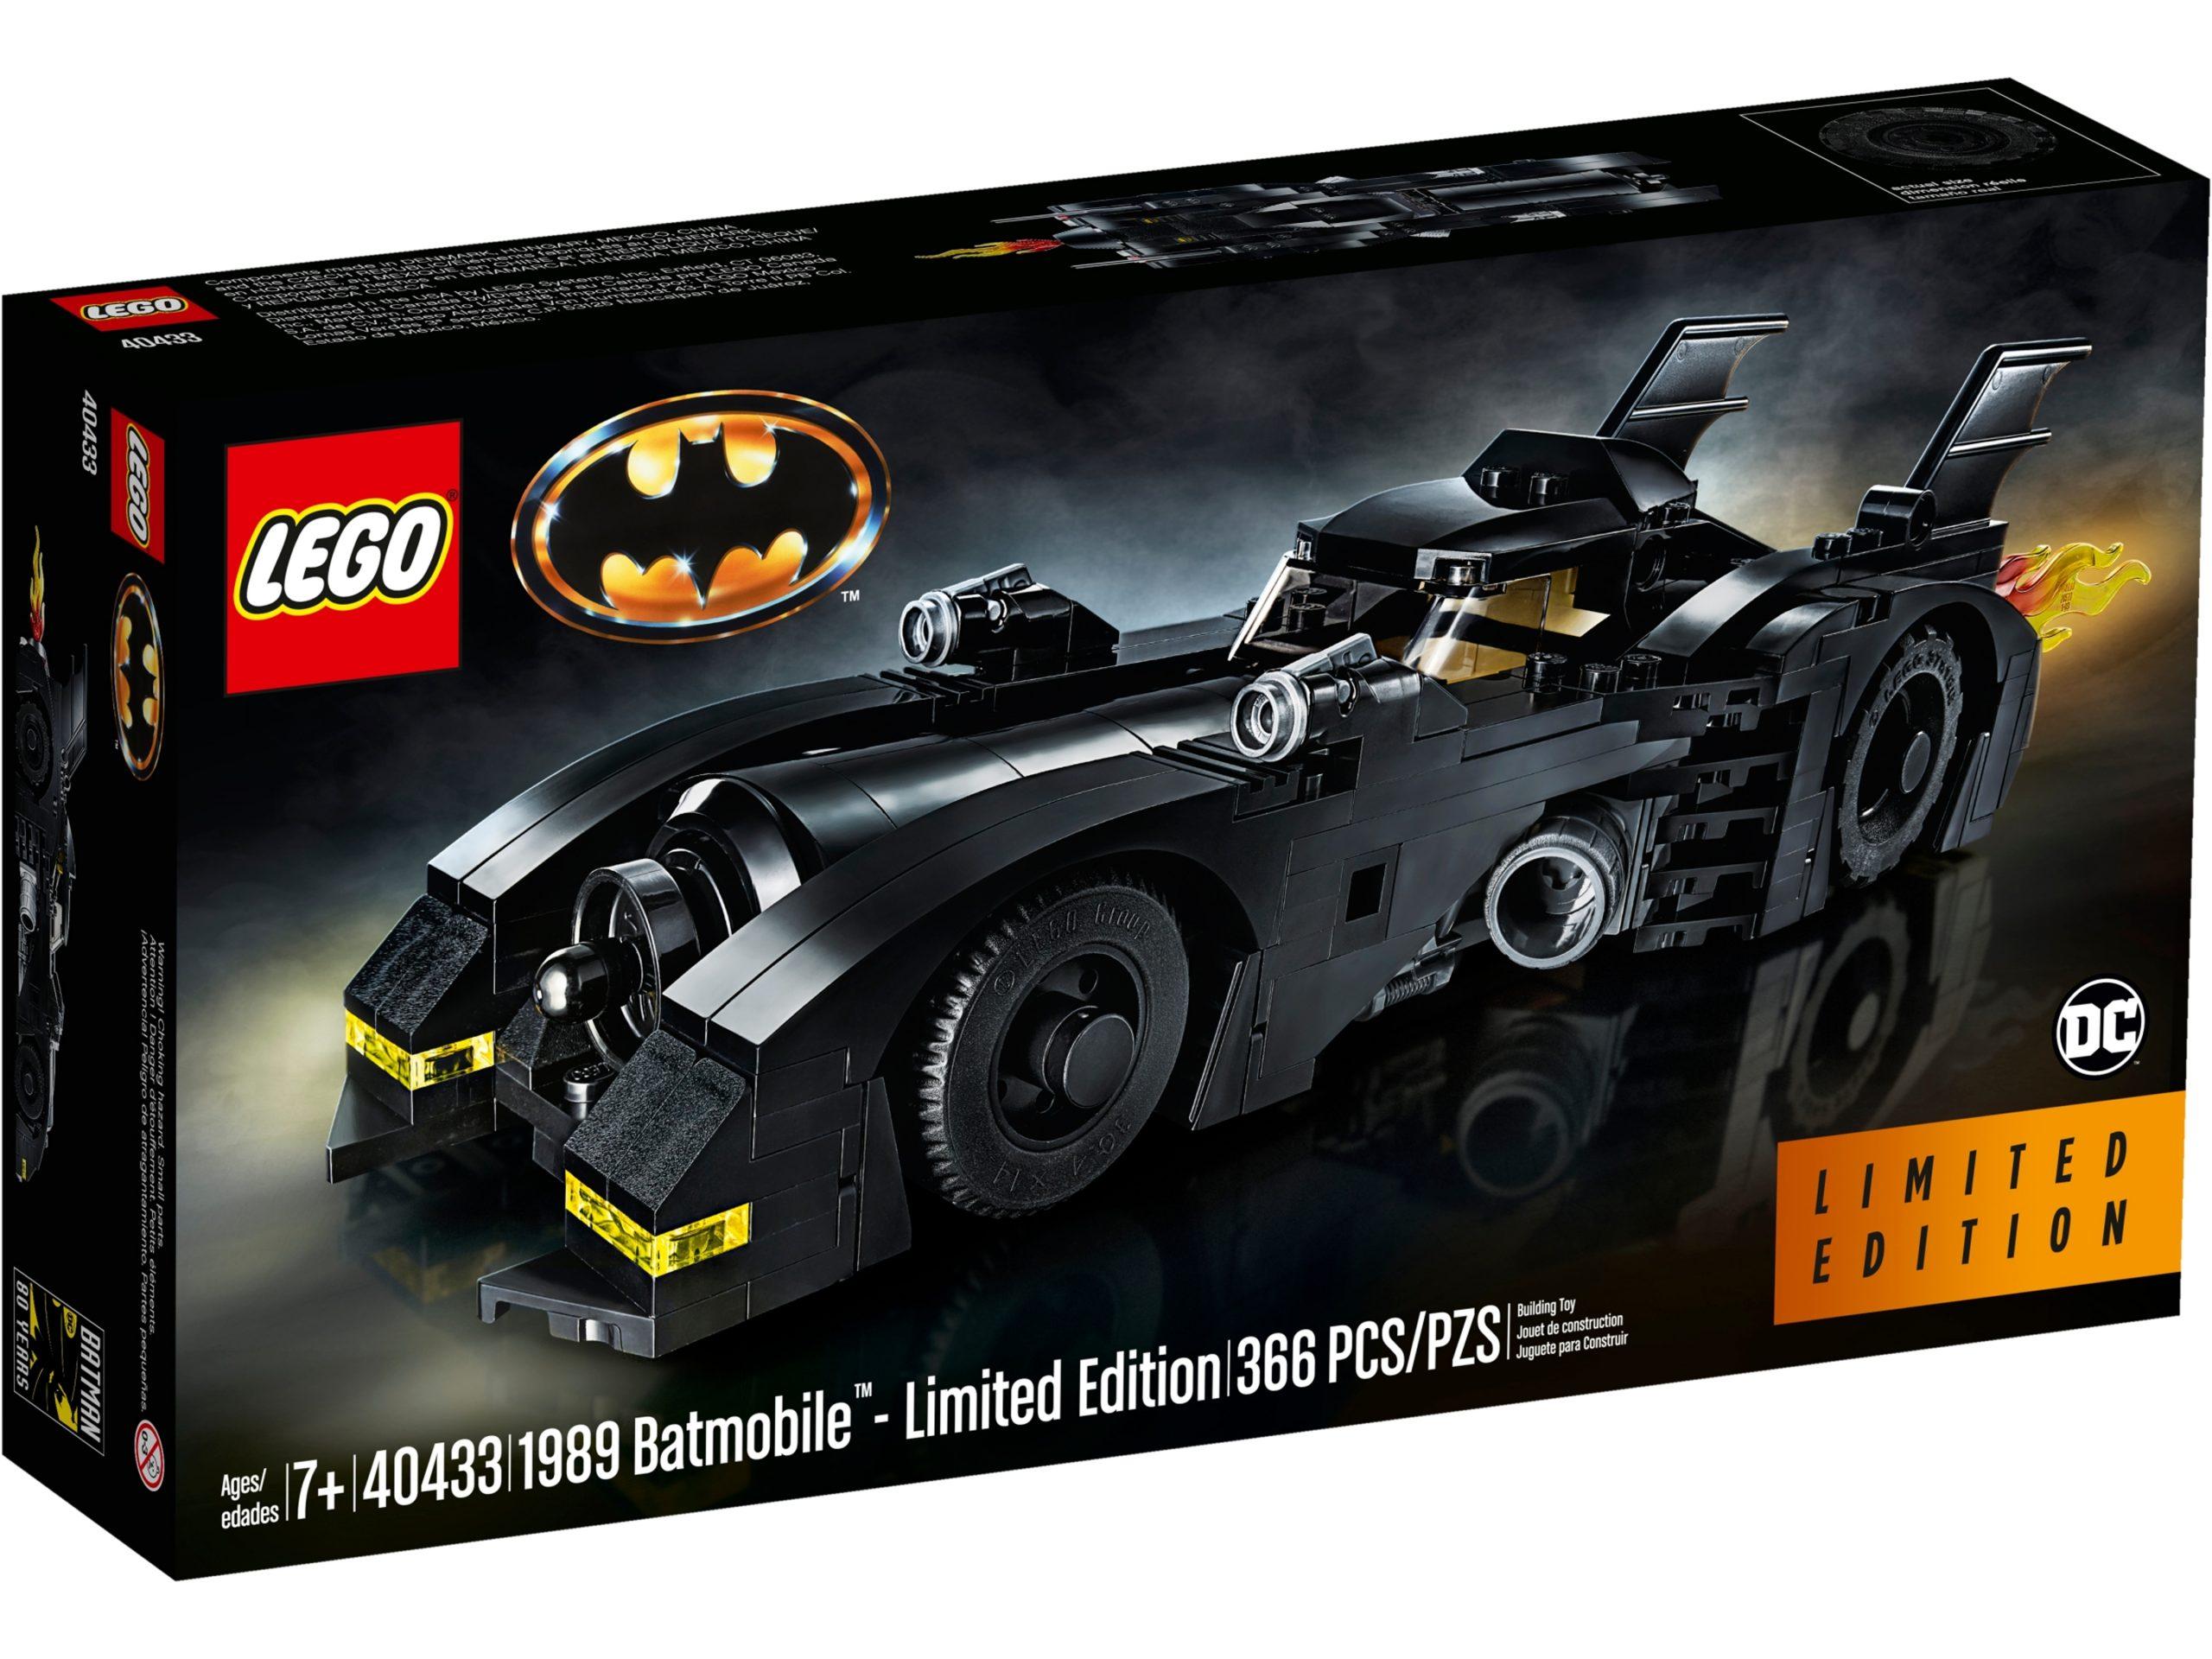 lego 40433 1989 batmobile limited edition scaled